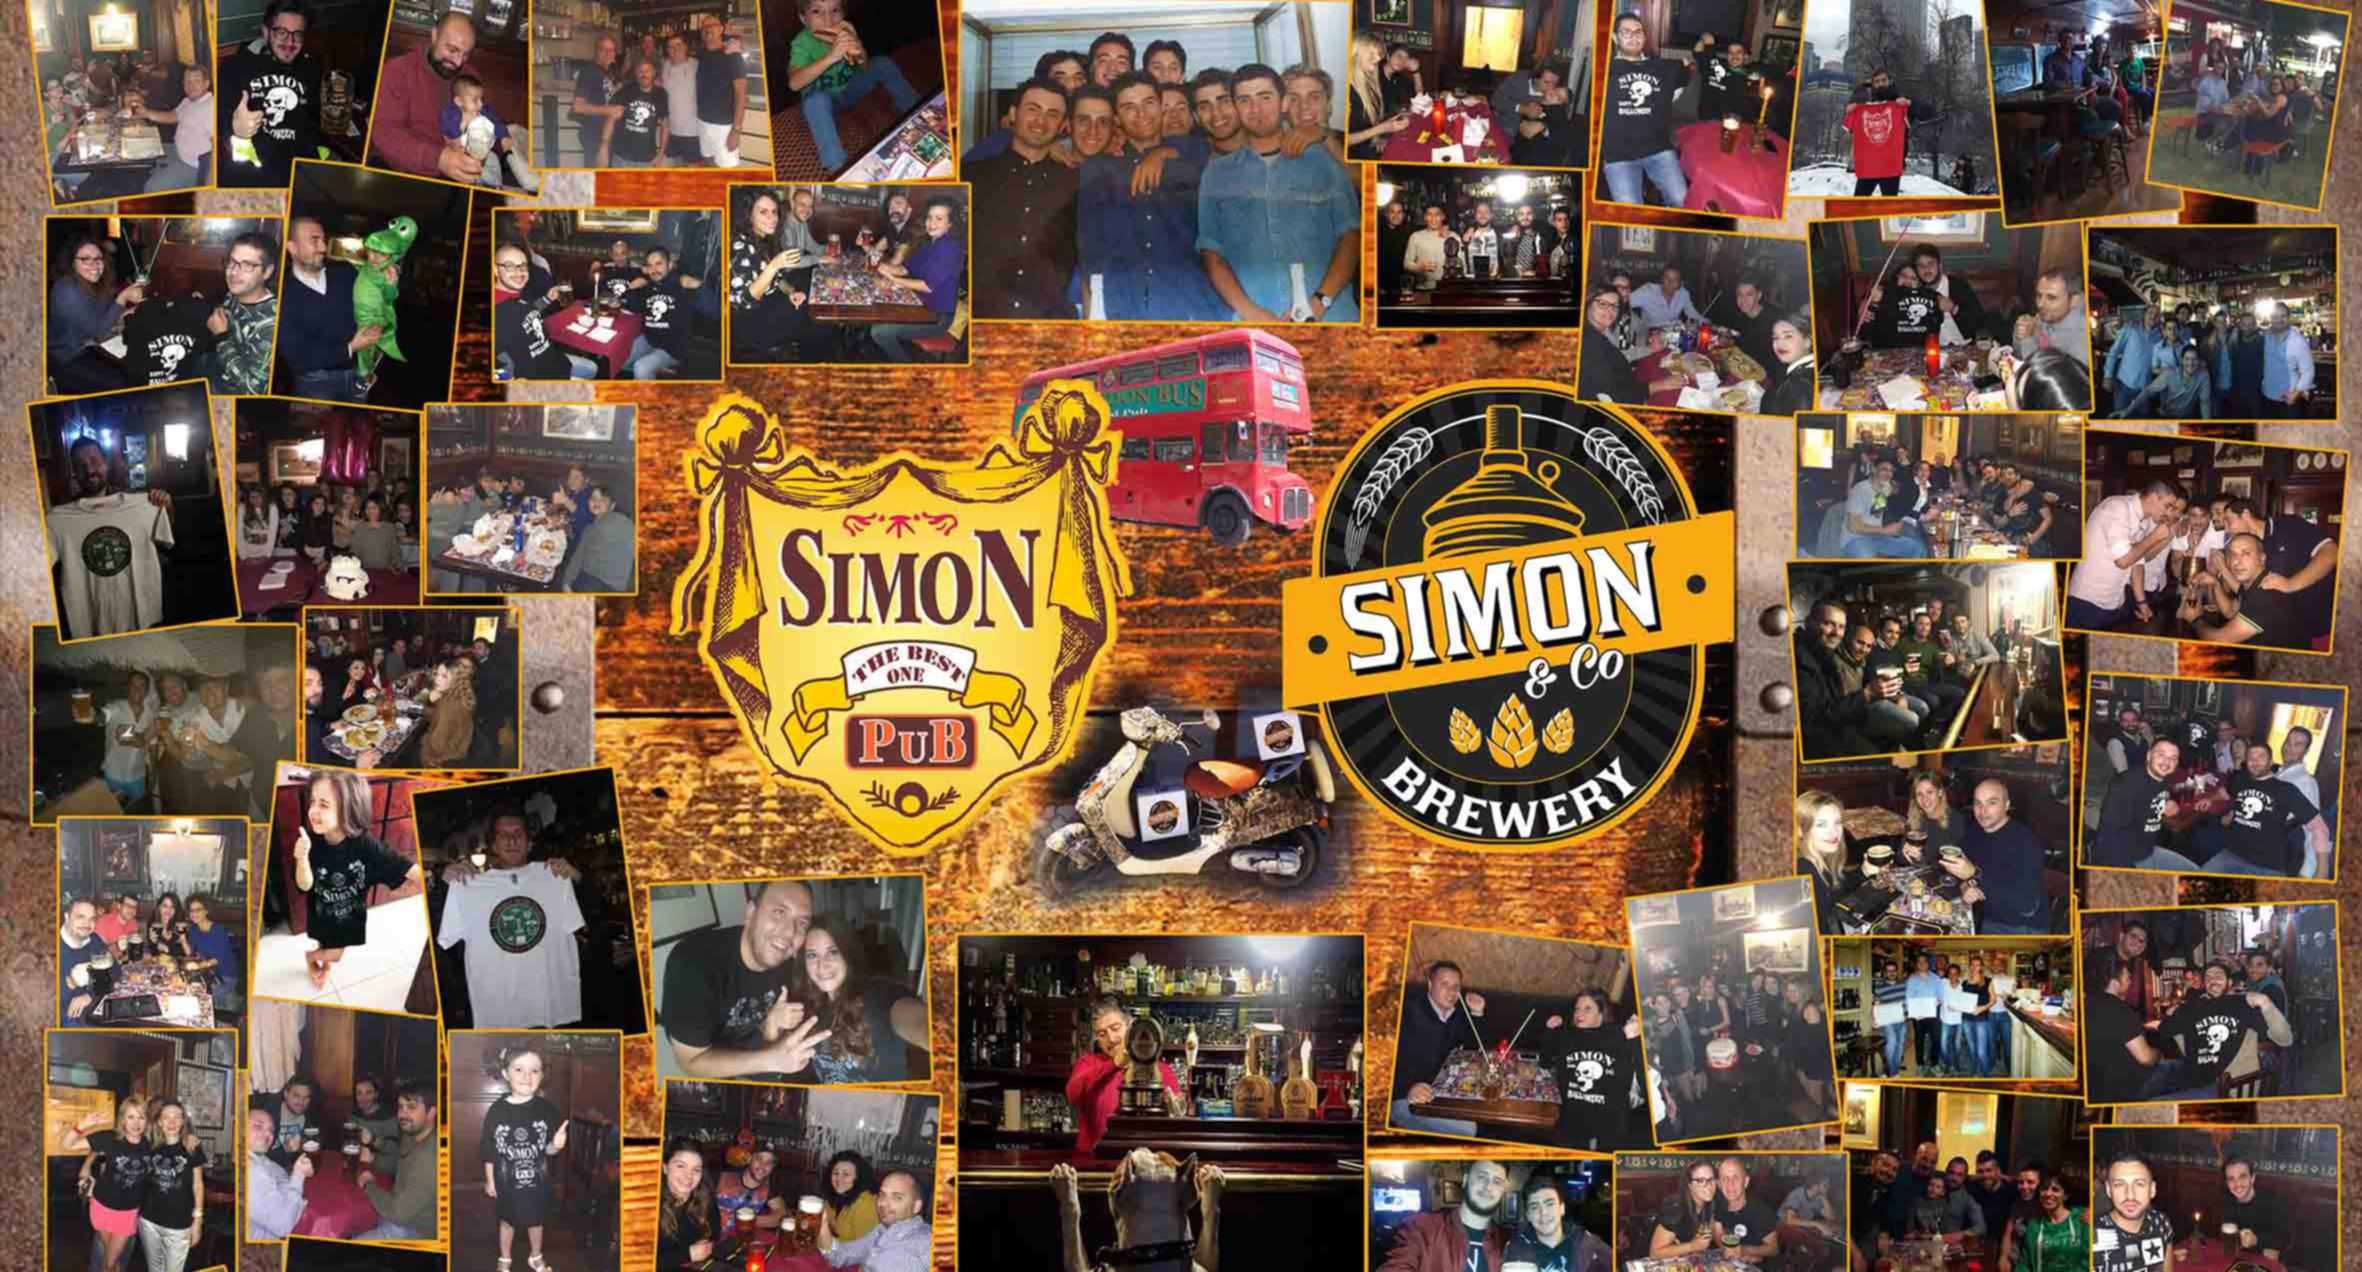 Il Simon Pub